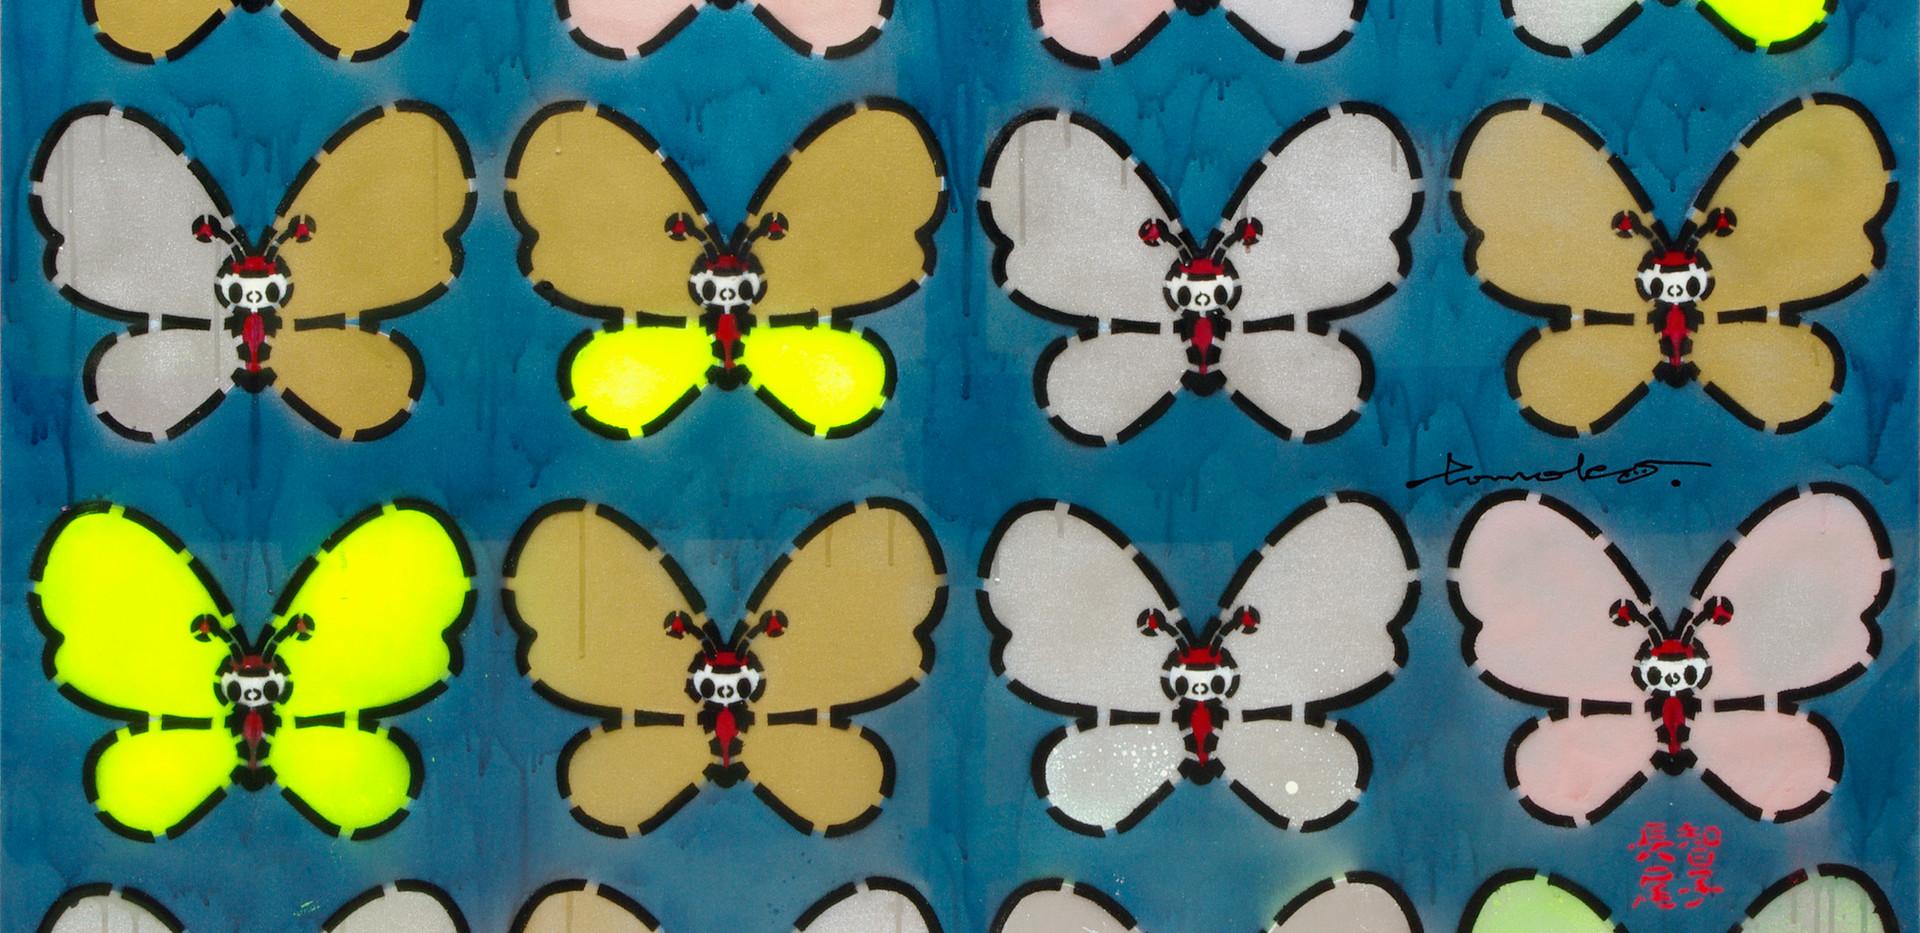 Tomoko Nagao - Butterflies 16 Bluemetal (2019)